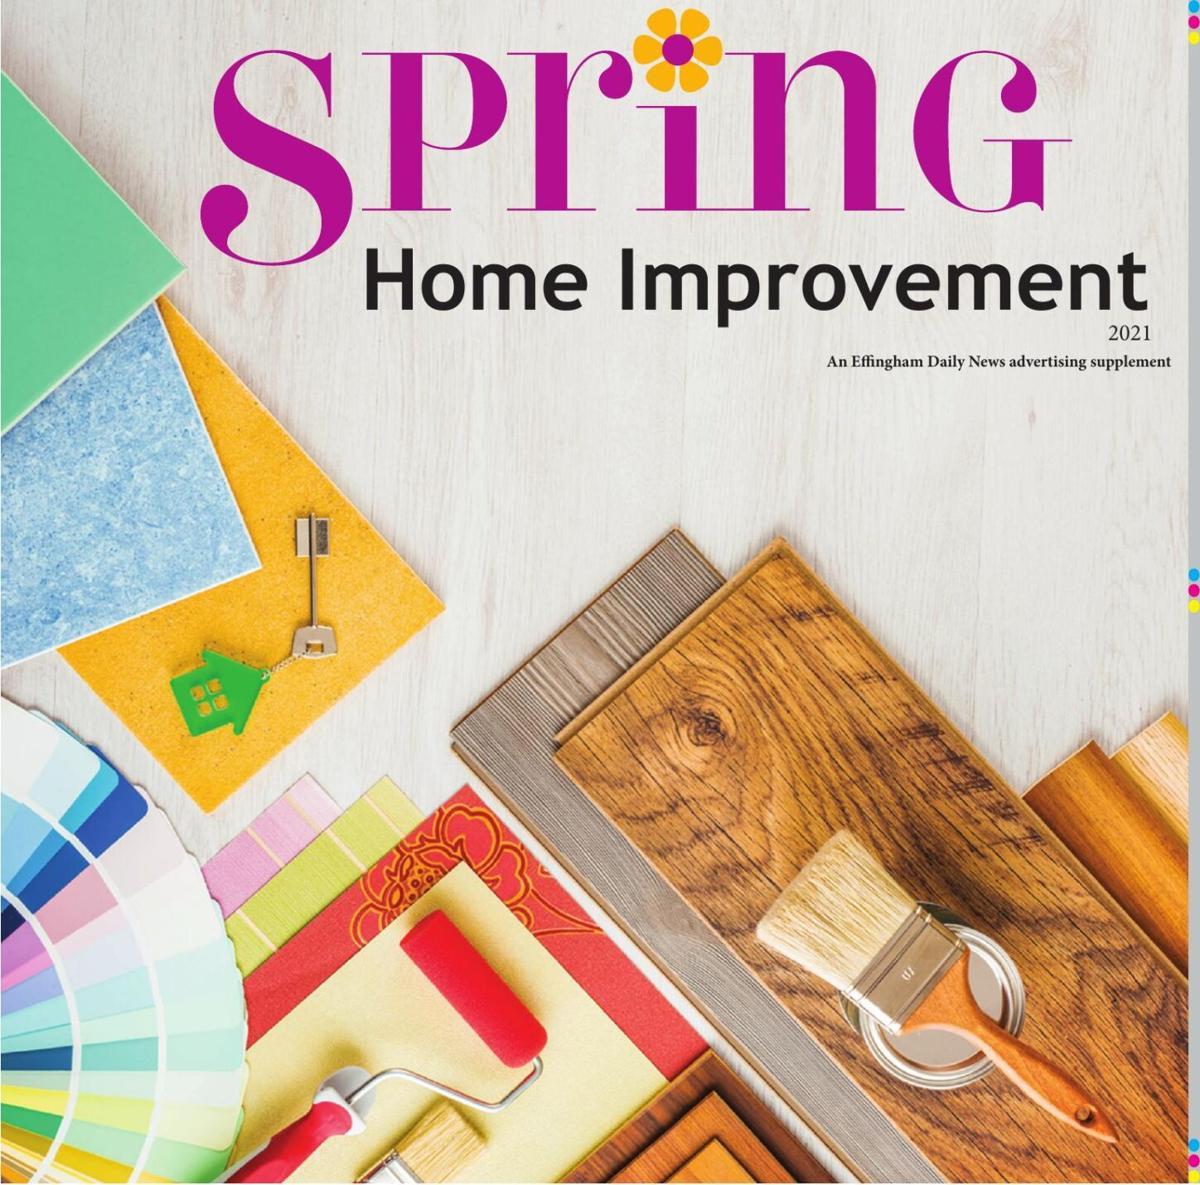 Spring Home Improvement 2021